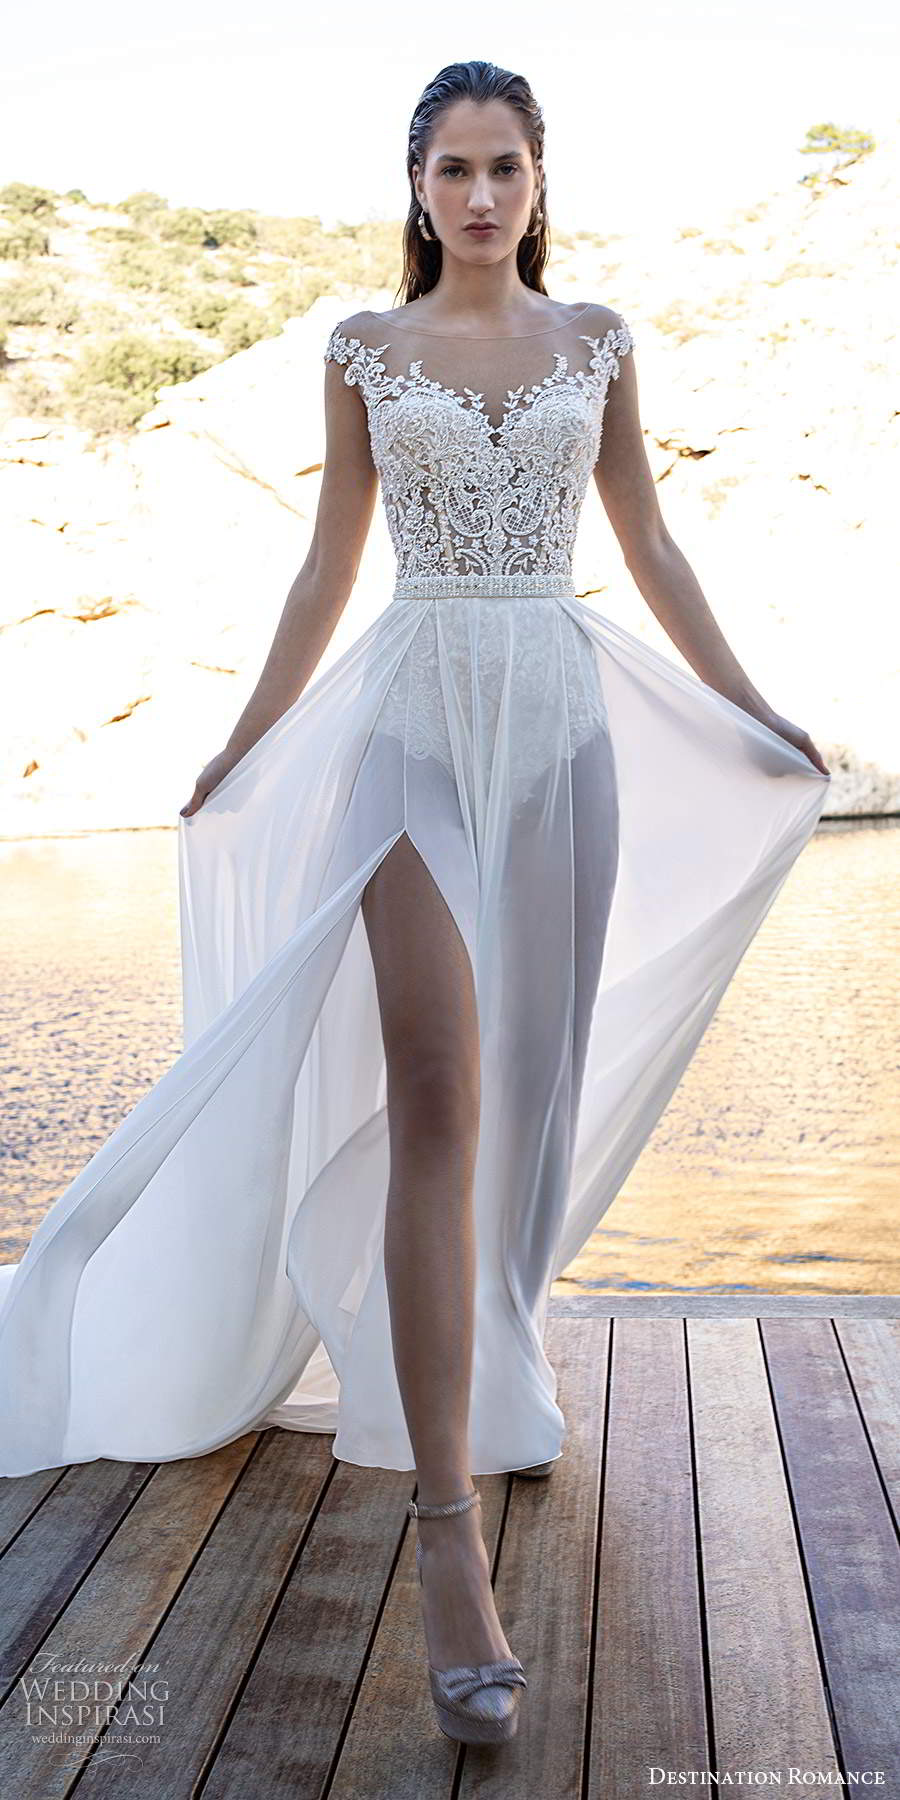 destination romance 2020 bridal cap sleeves illusion bateau sweetheart neckline embellished bodice bodysuit wedding dress a line overskirt (15) mv